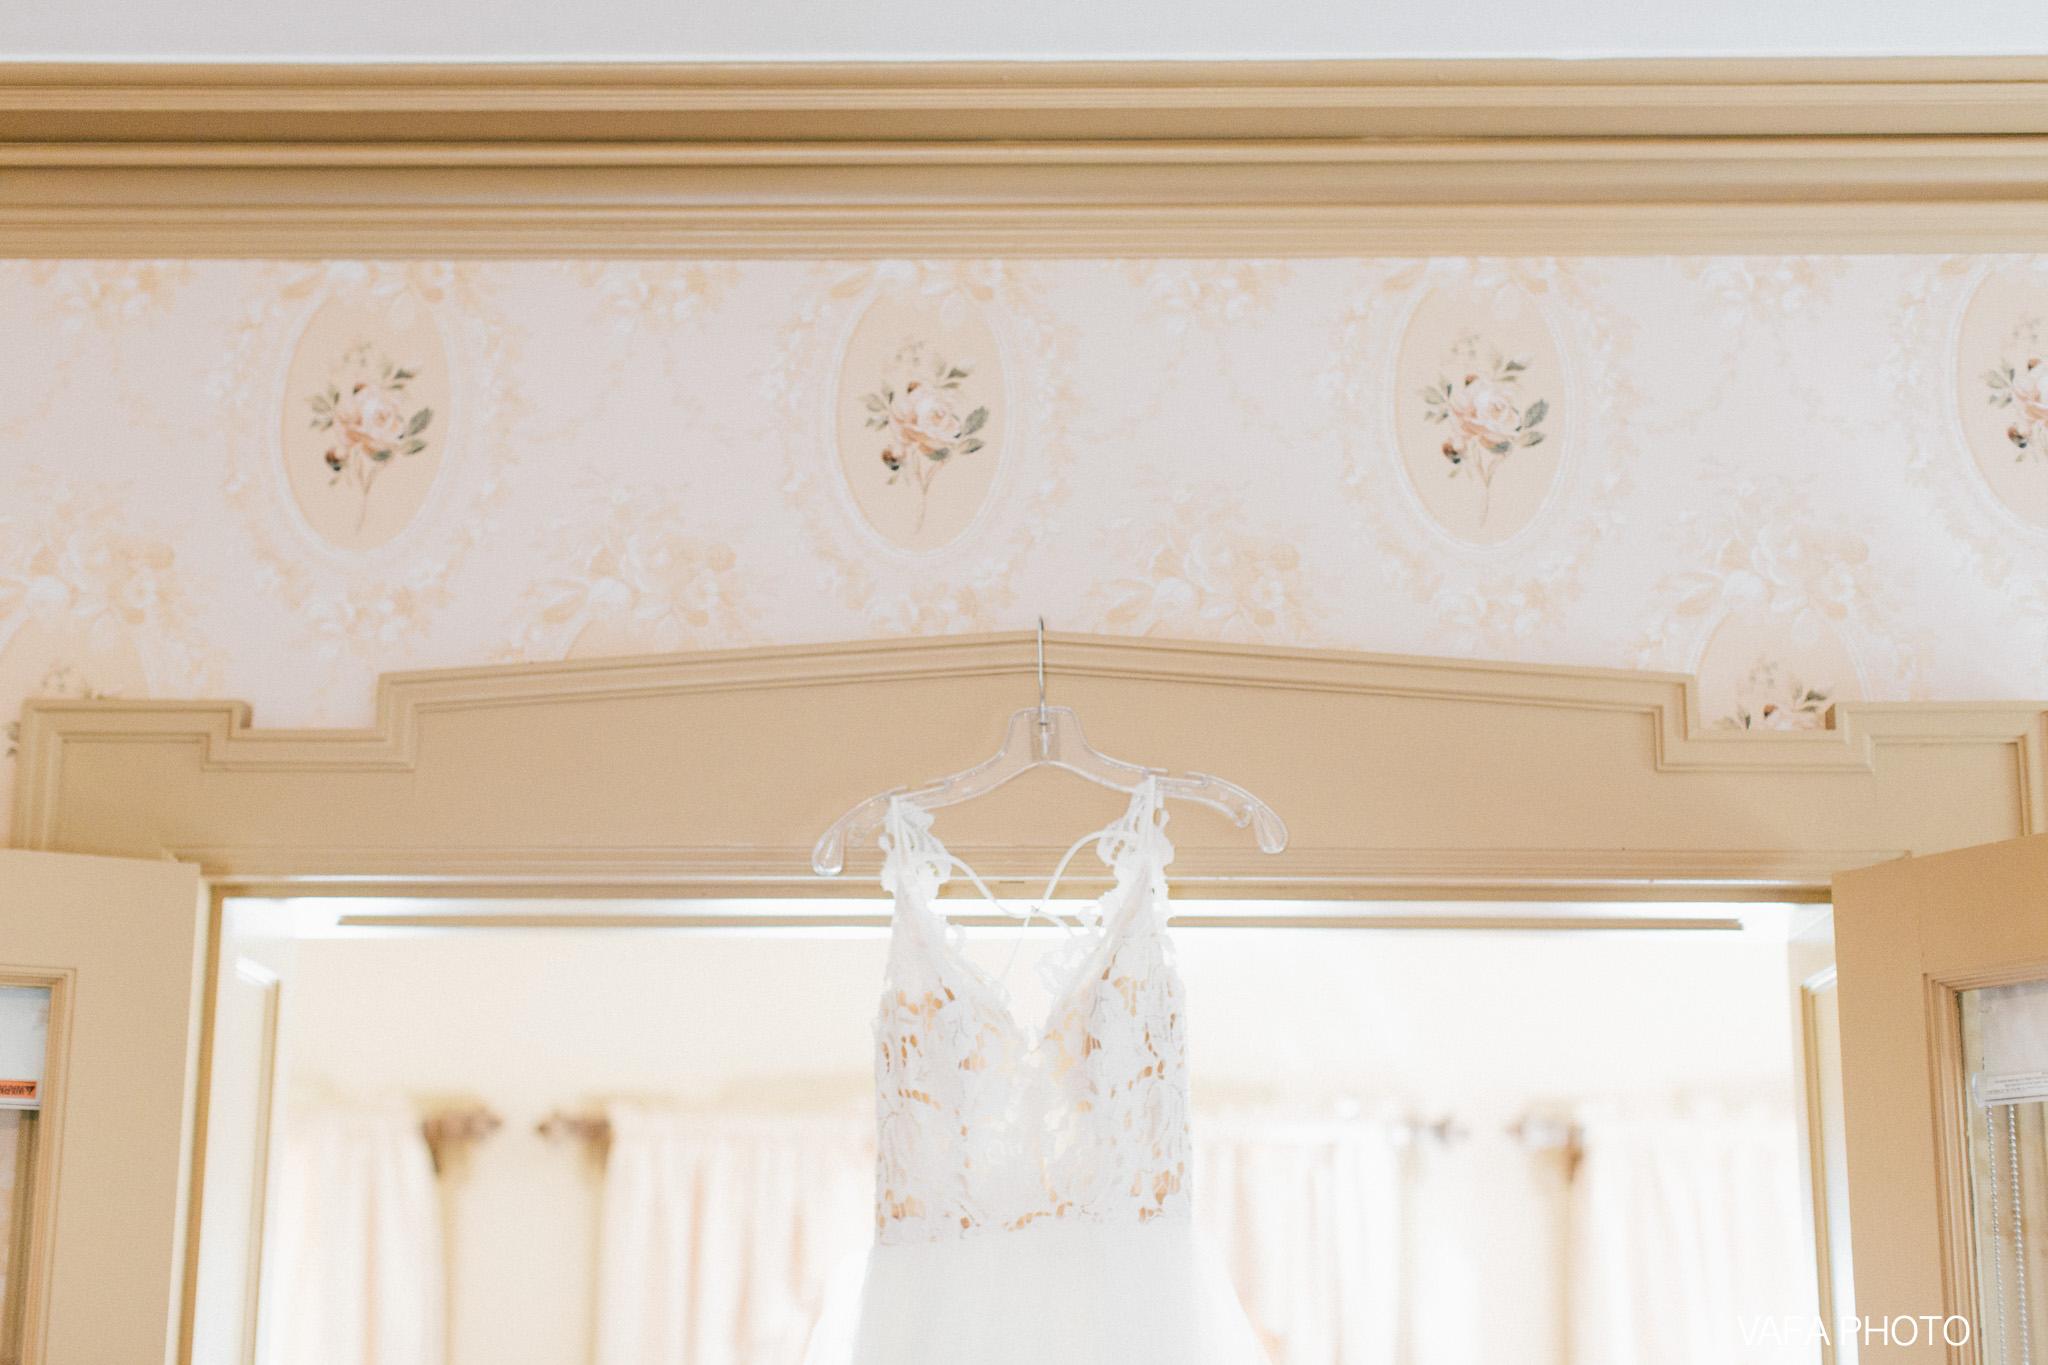 The-Felt-Estate-Wedding-Kailie-David-Vafa-Photo-72.jpg